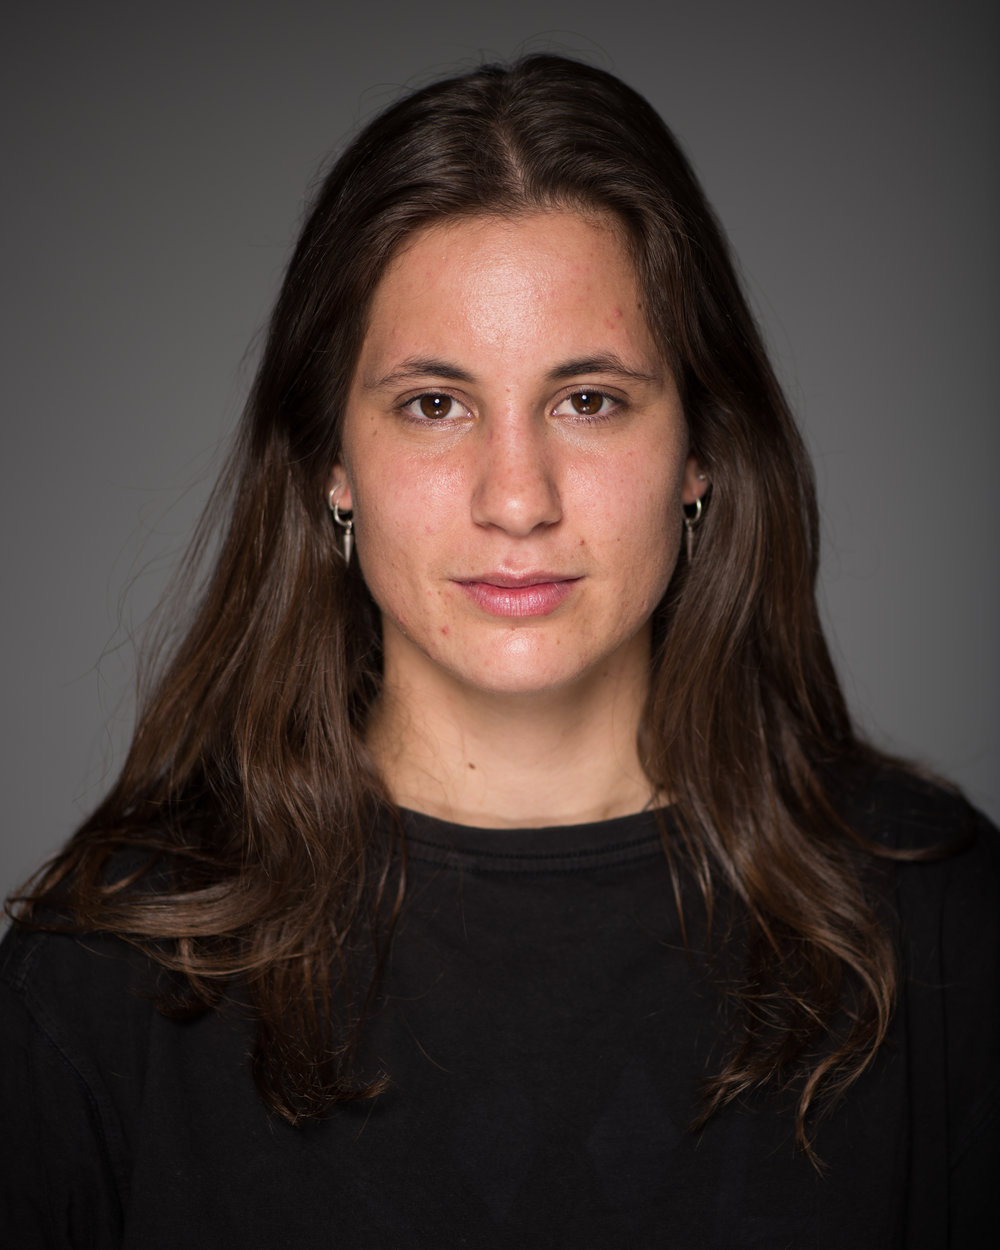 Michaela Tancheff